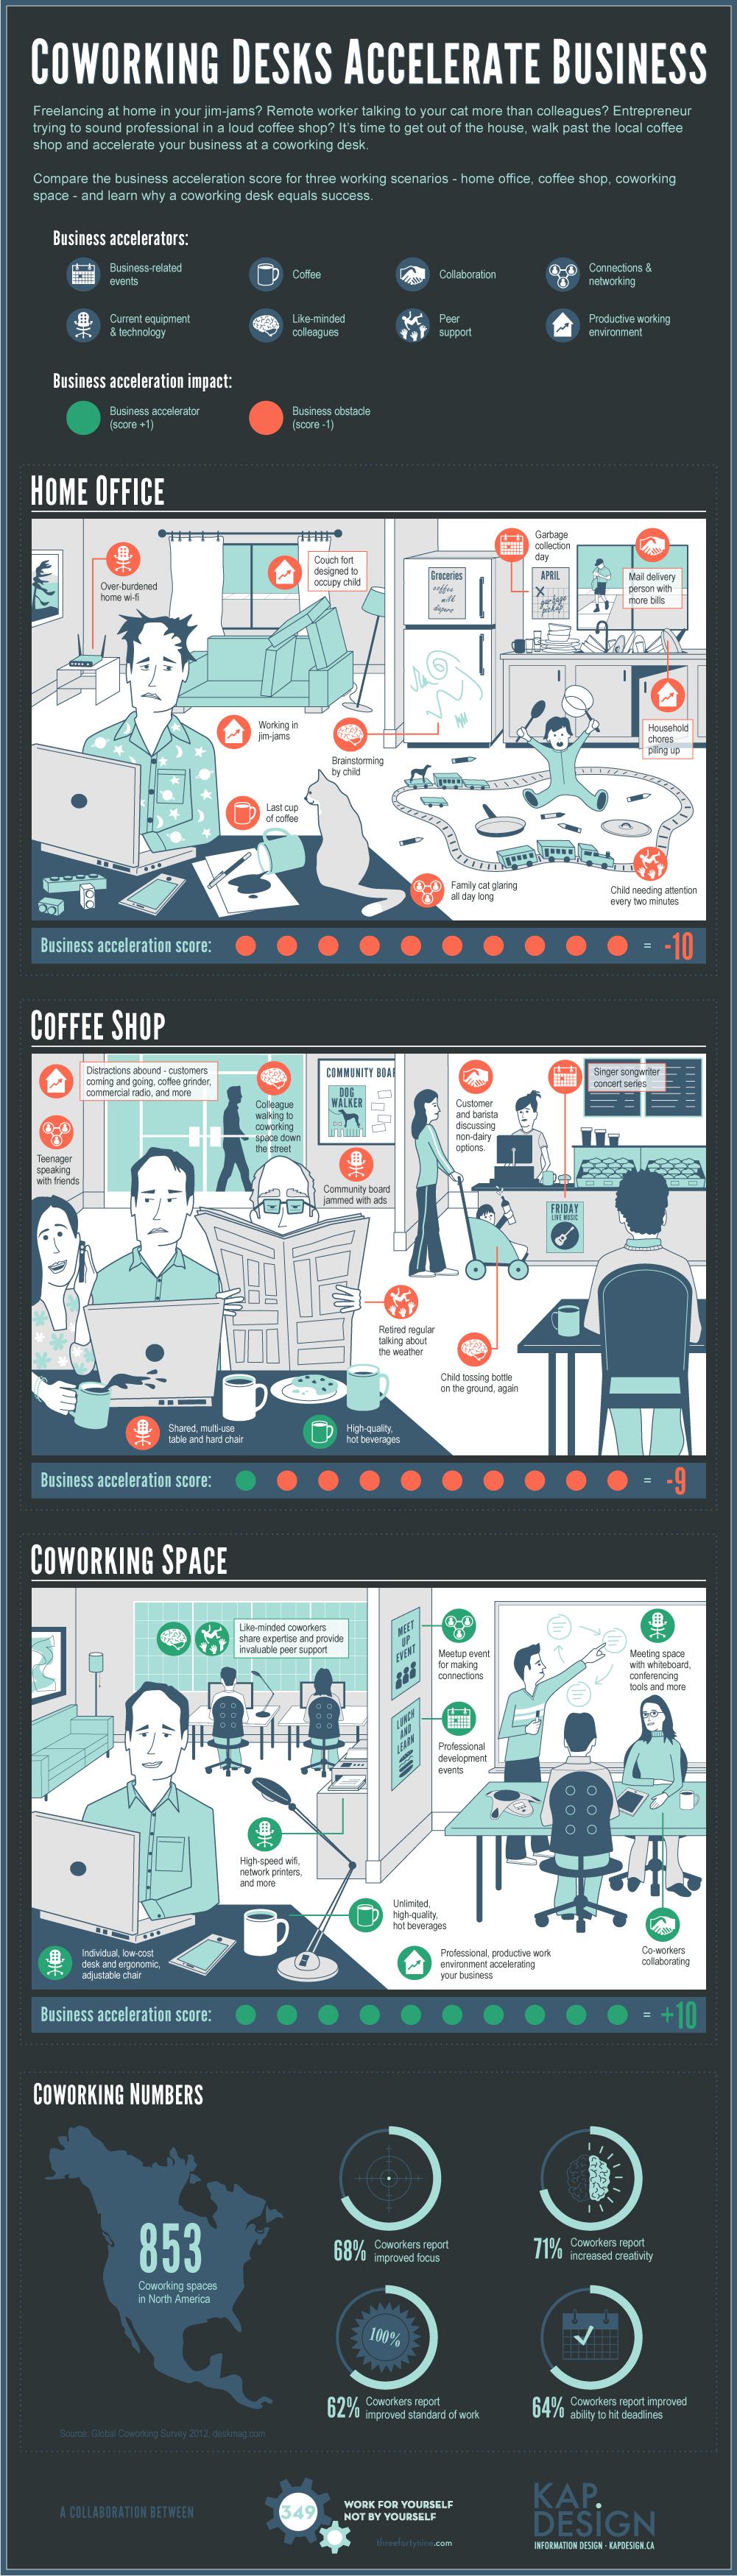 Coworking desks accelerate business